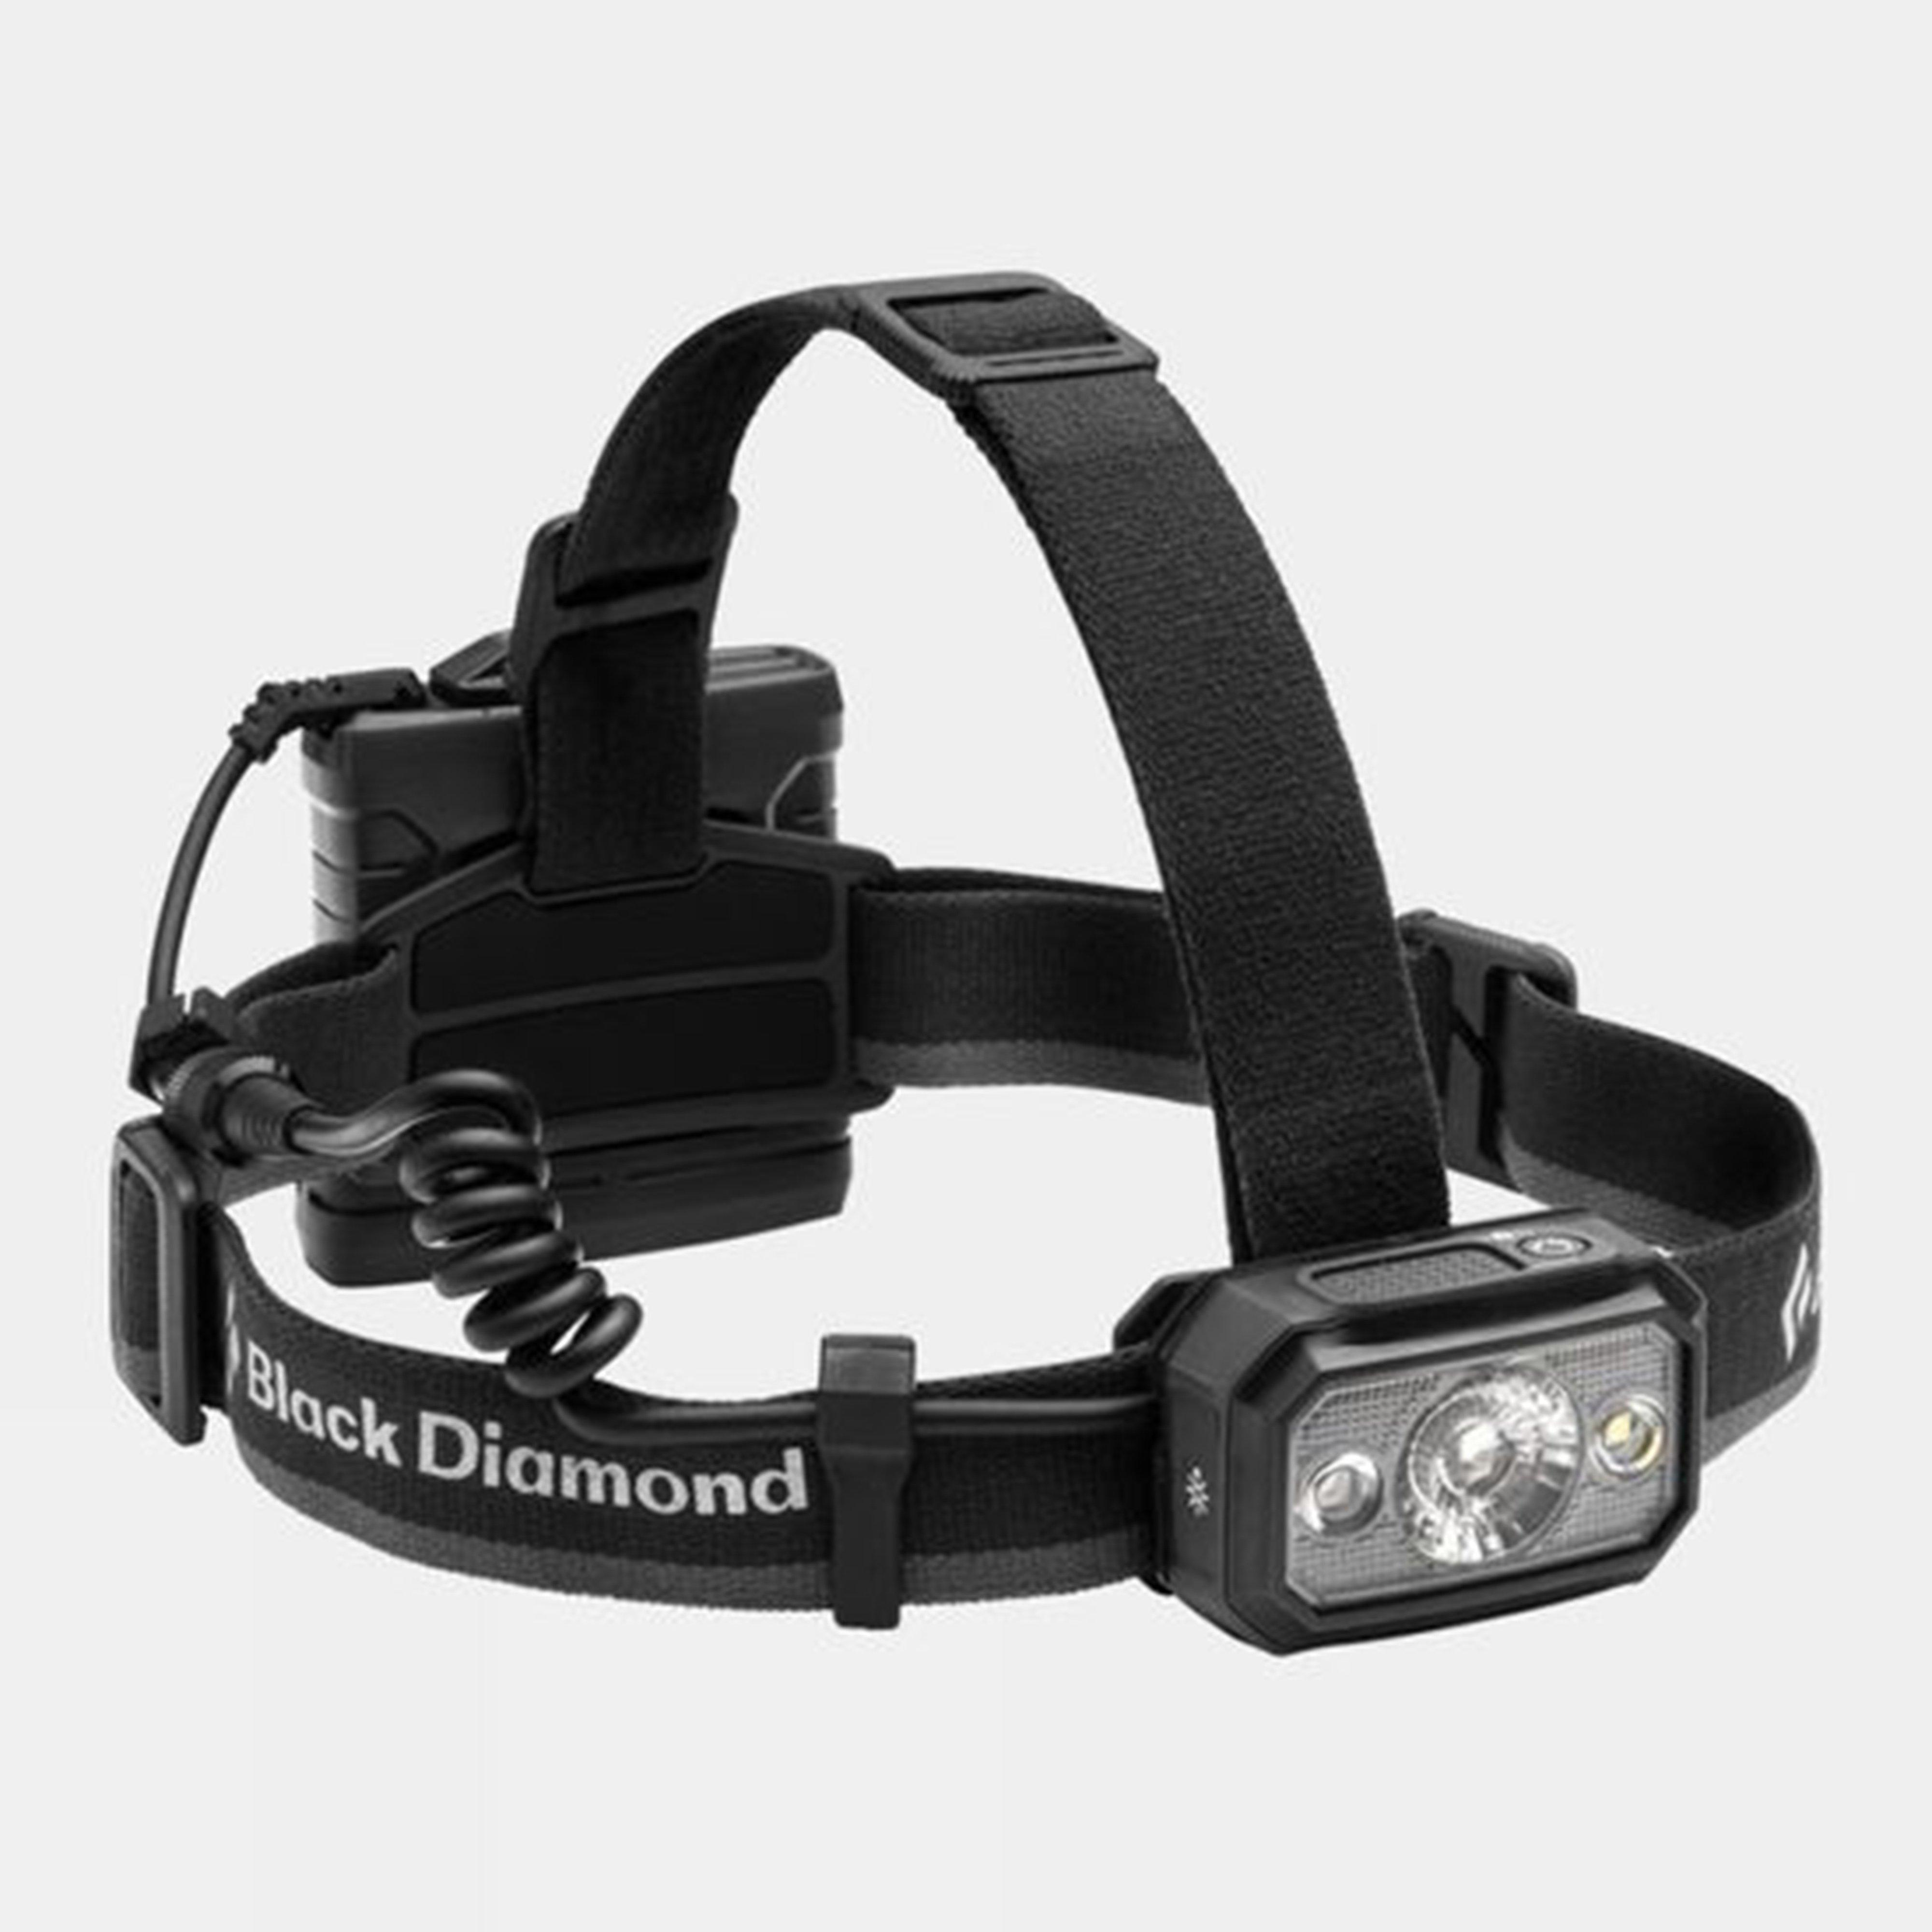 Black Diamond Icon 700 Headlamp - Blk/Blk, Black